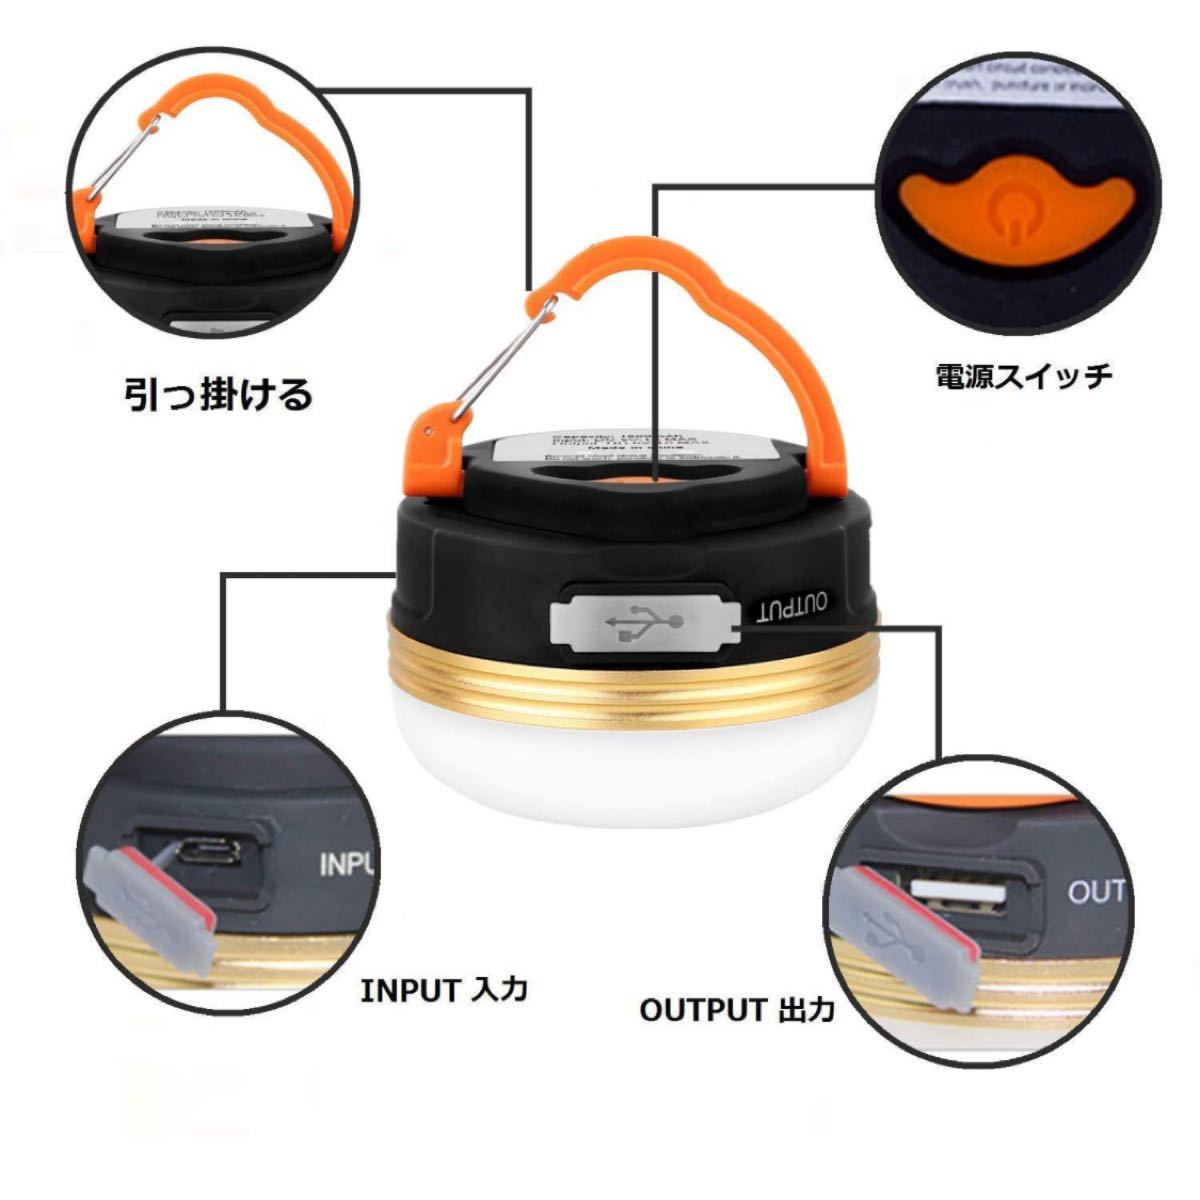 LEDランタン 暖色 USB充電式 超軽量 IP65 三つ点灯モード 防水 防災対策 登山 夜釣り キャンプ用